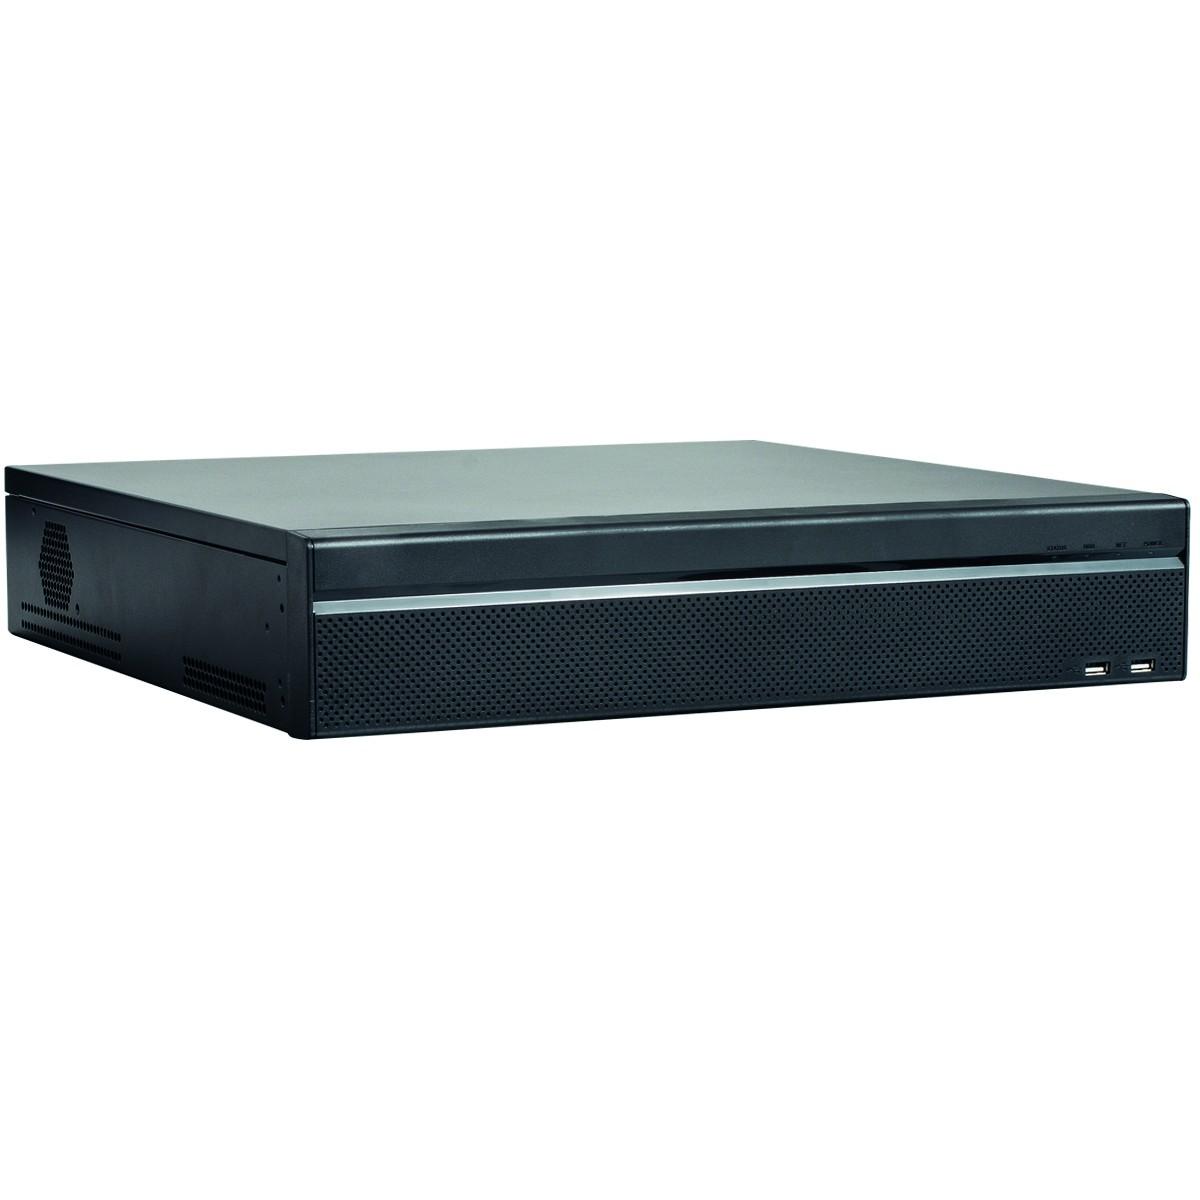 "4K NVR Rekorder, 32 Kanal, 16x PoE bis 12 Megapixel, 320 Mbps, 19"" Gehäuse 1.5HE, Quad Core, 4x SATA"